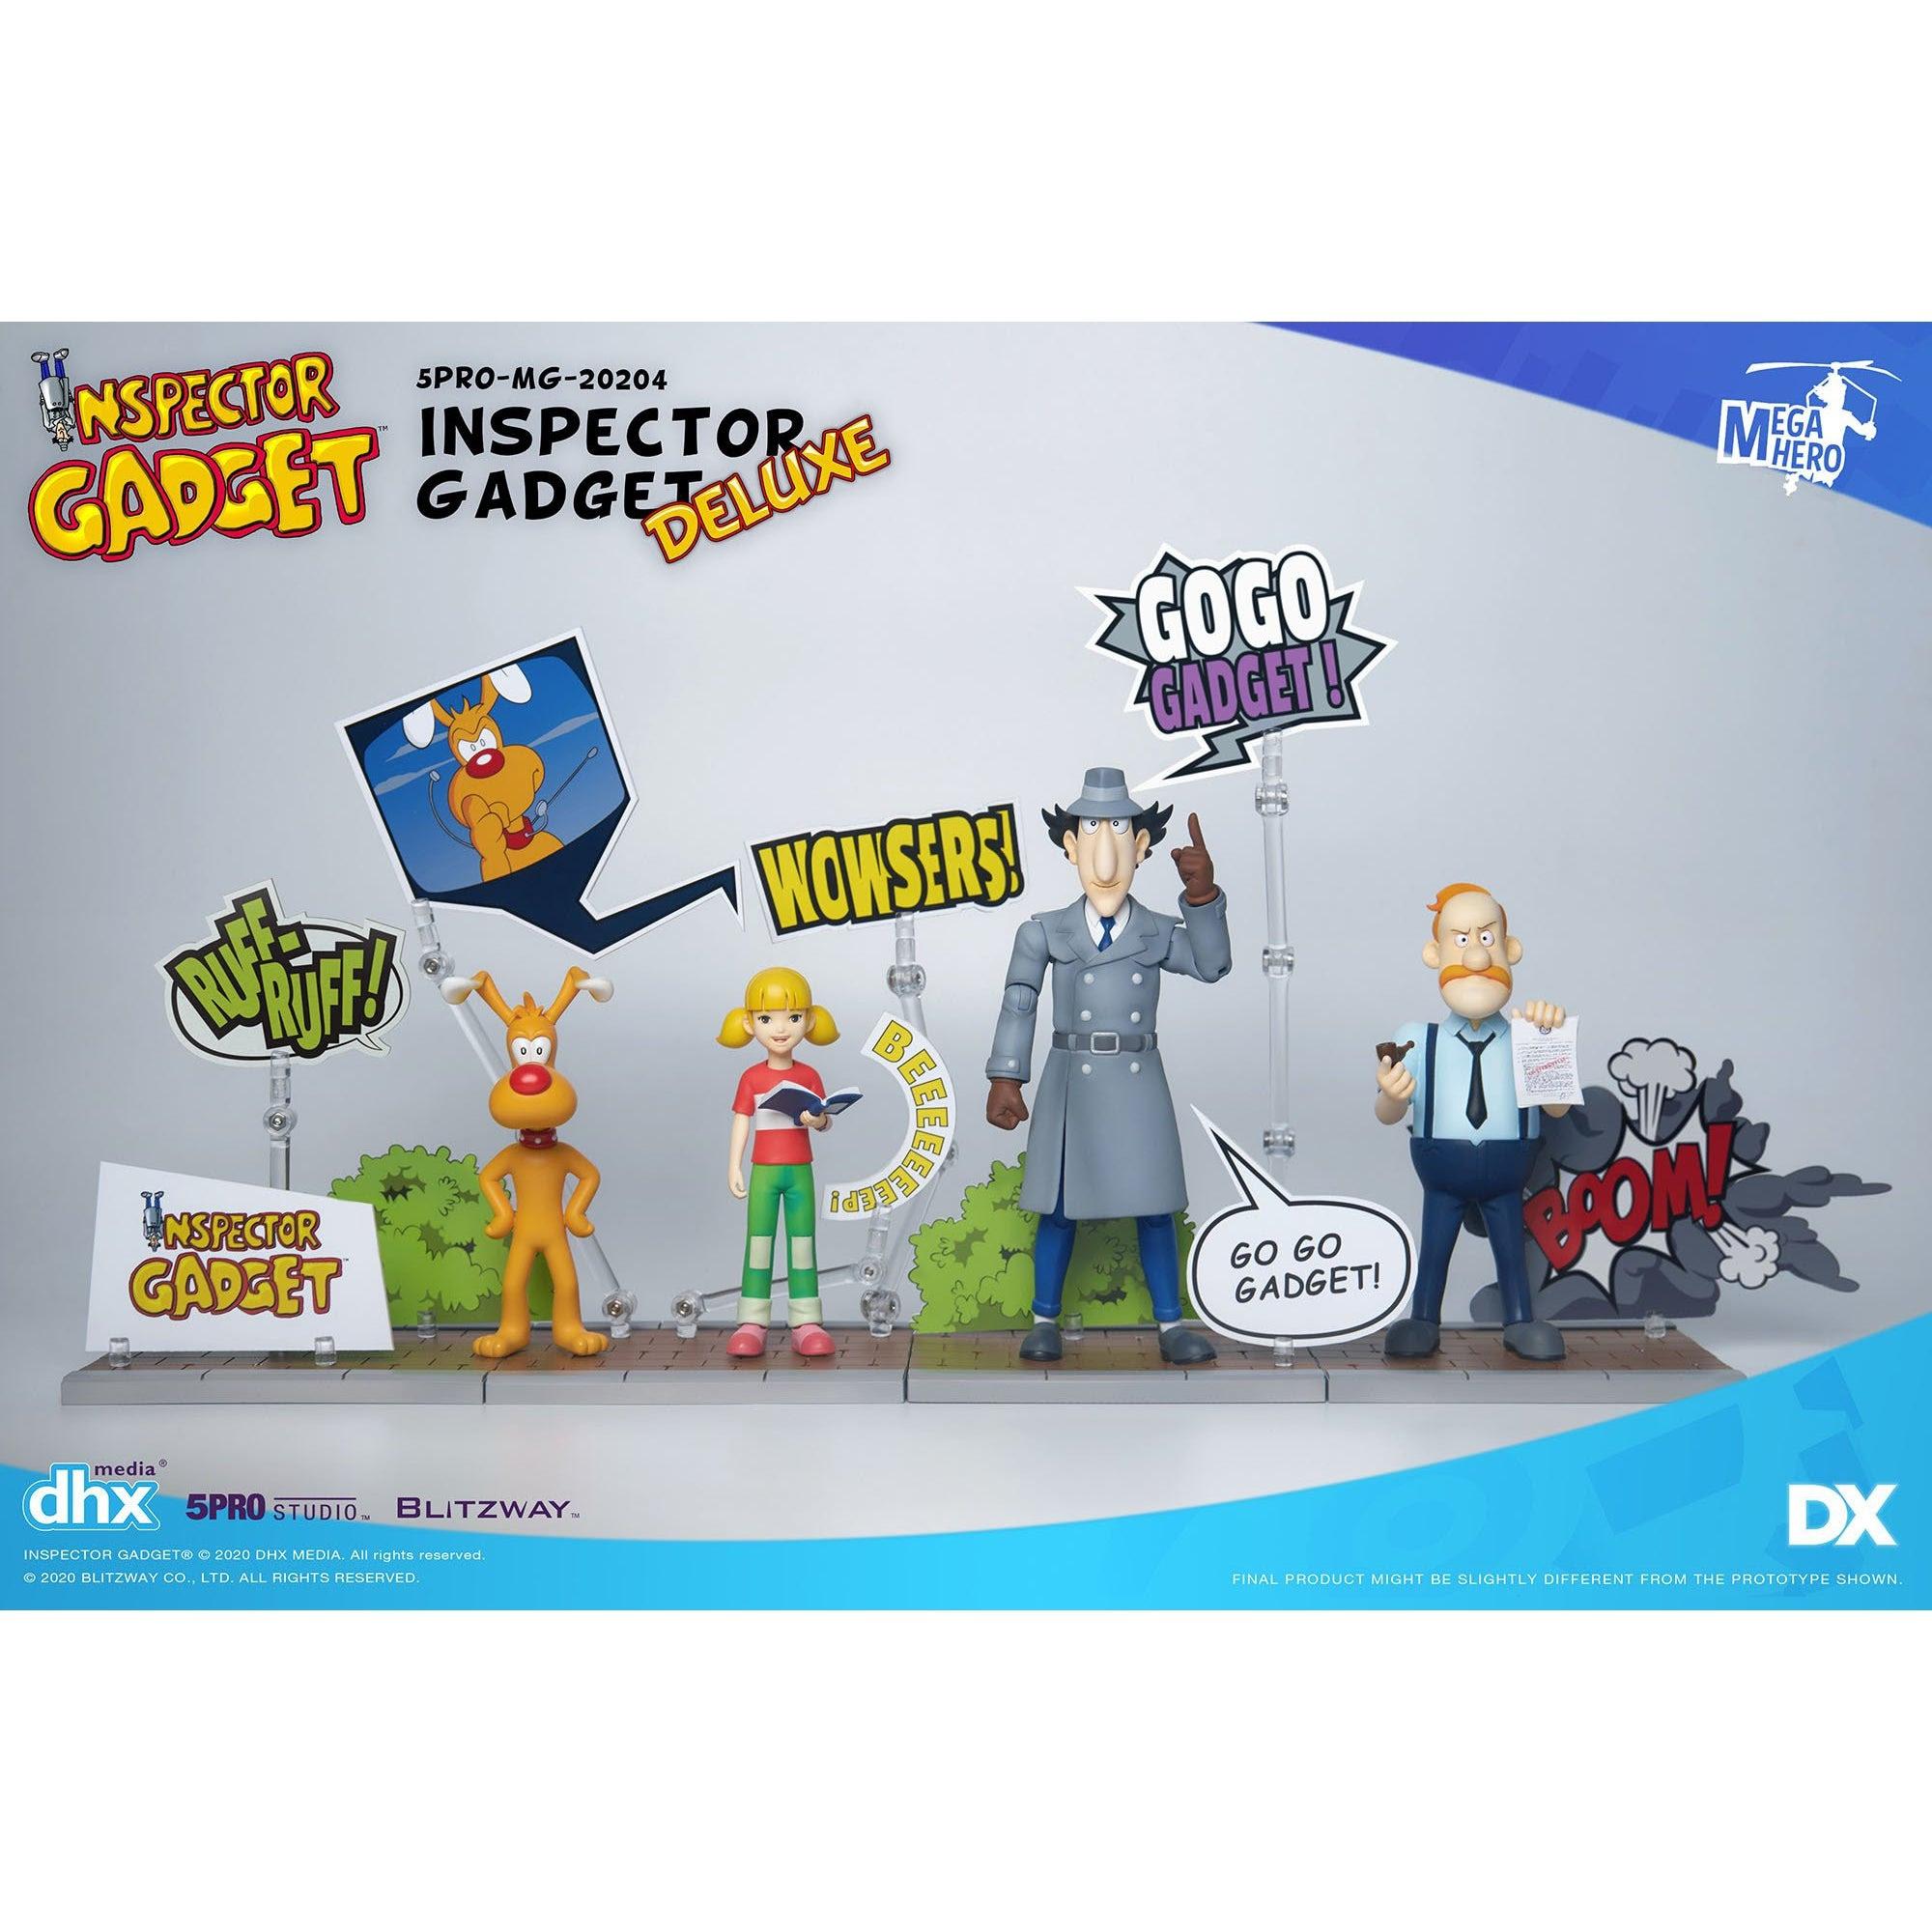 Image of Inspector Gadget MEGAHERO SERIES - Inspector Gadget 1:12 Scale Action Figure DX.ver Set of 4 - Q4 2020